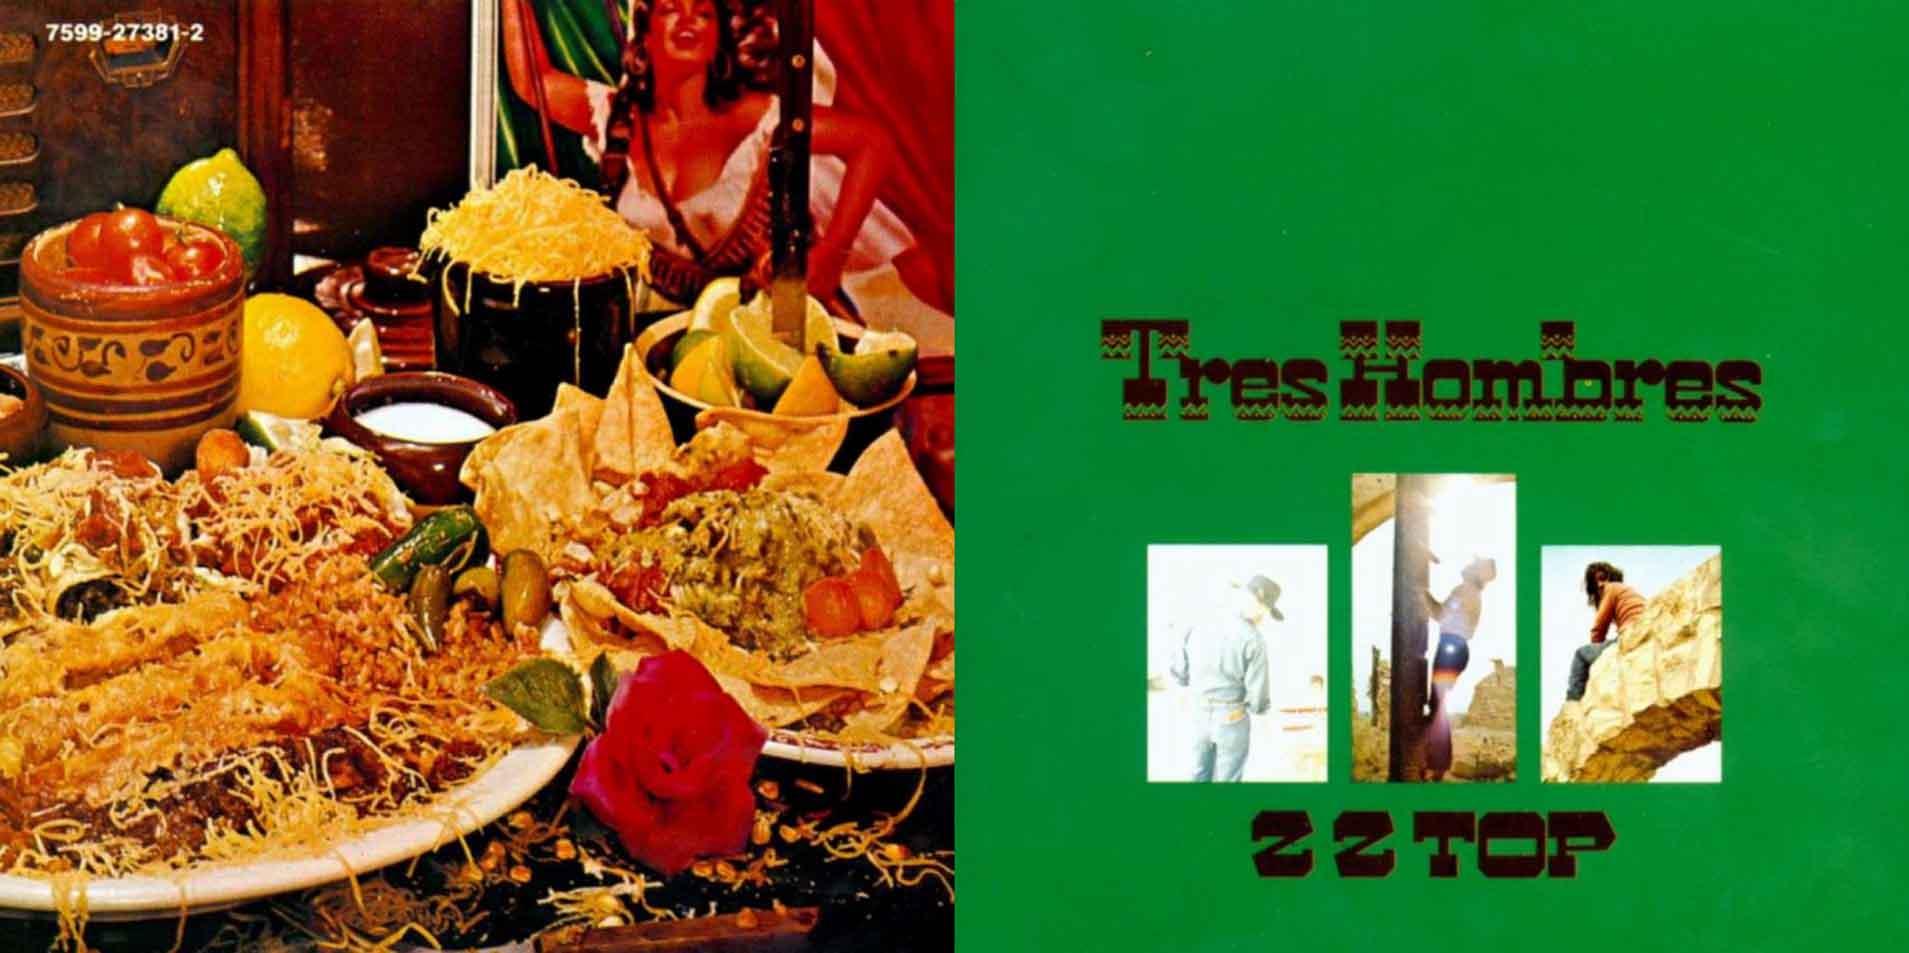 ZZ Top Tres Hombres Album